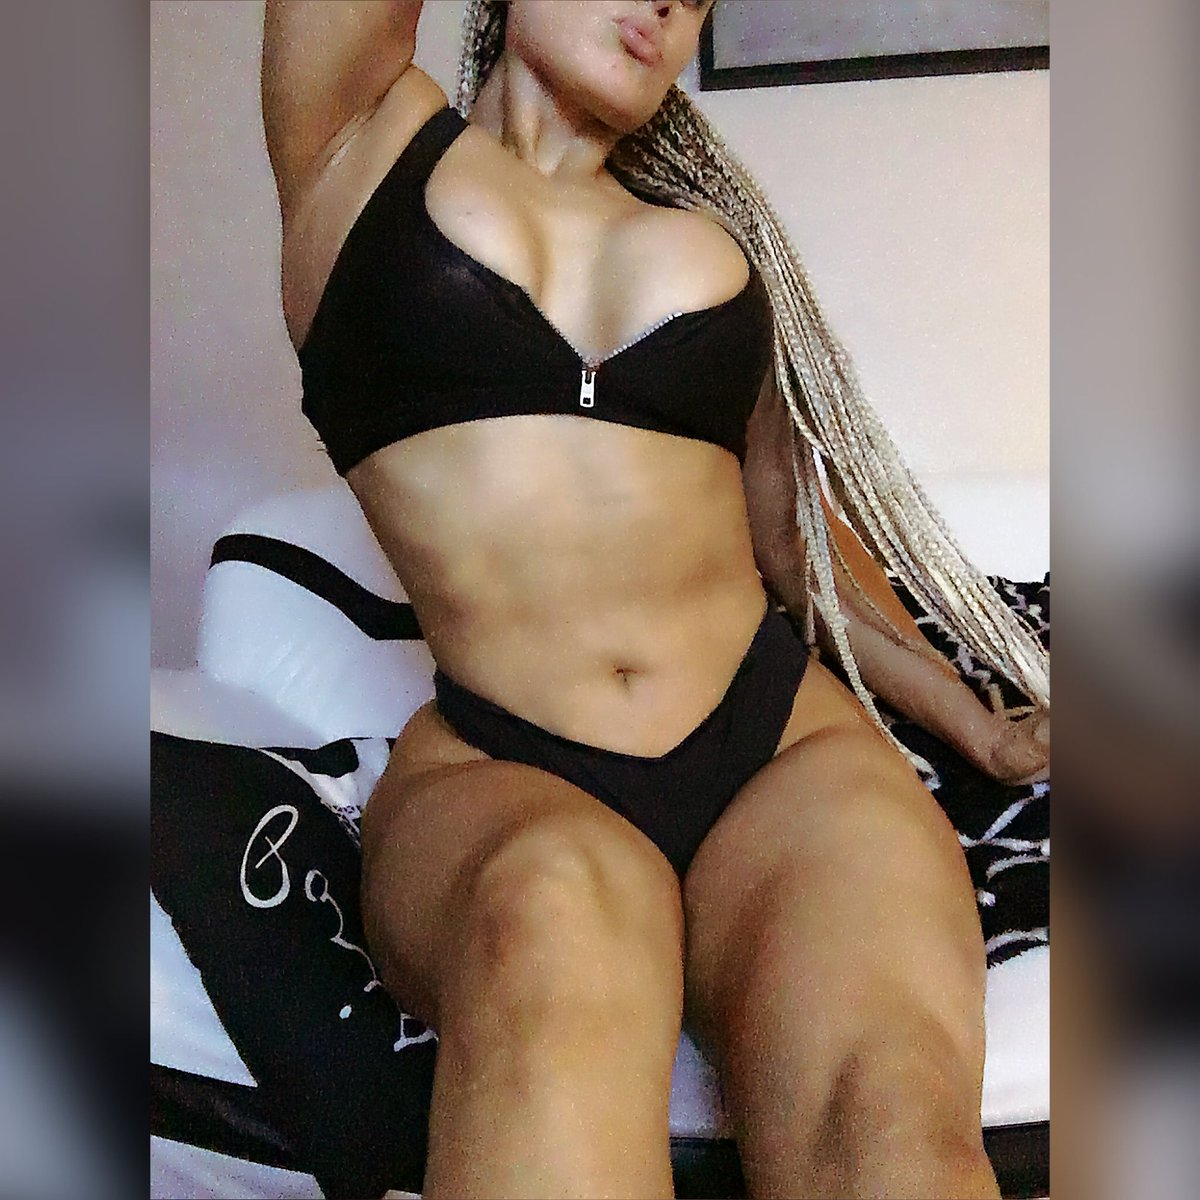 Antoinette Soto